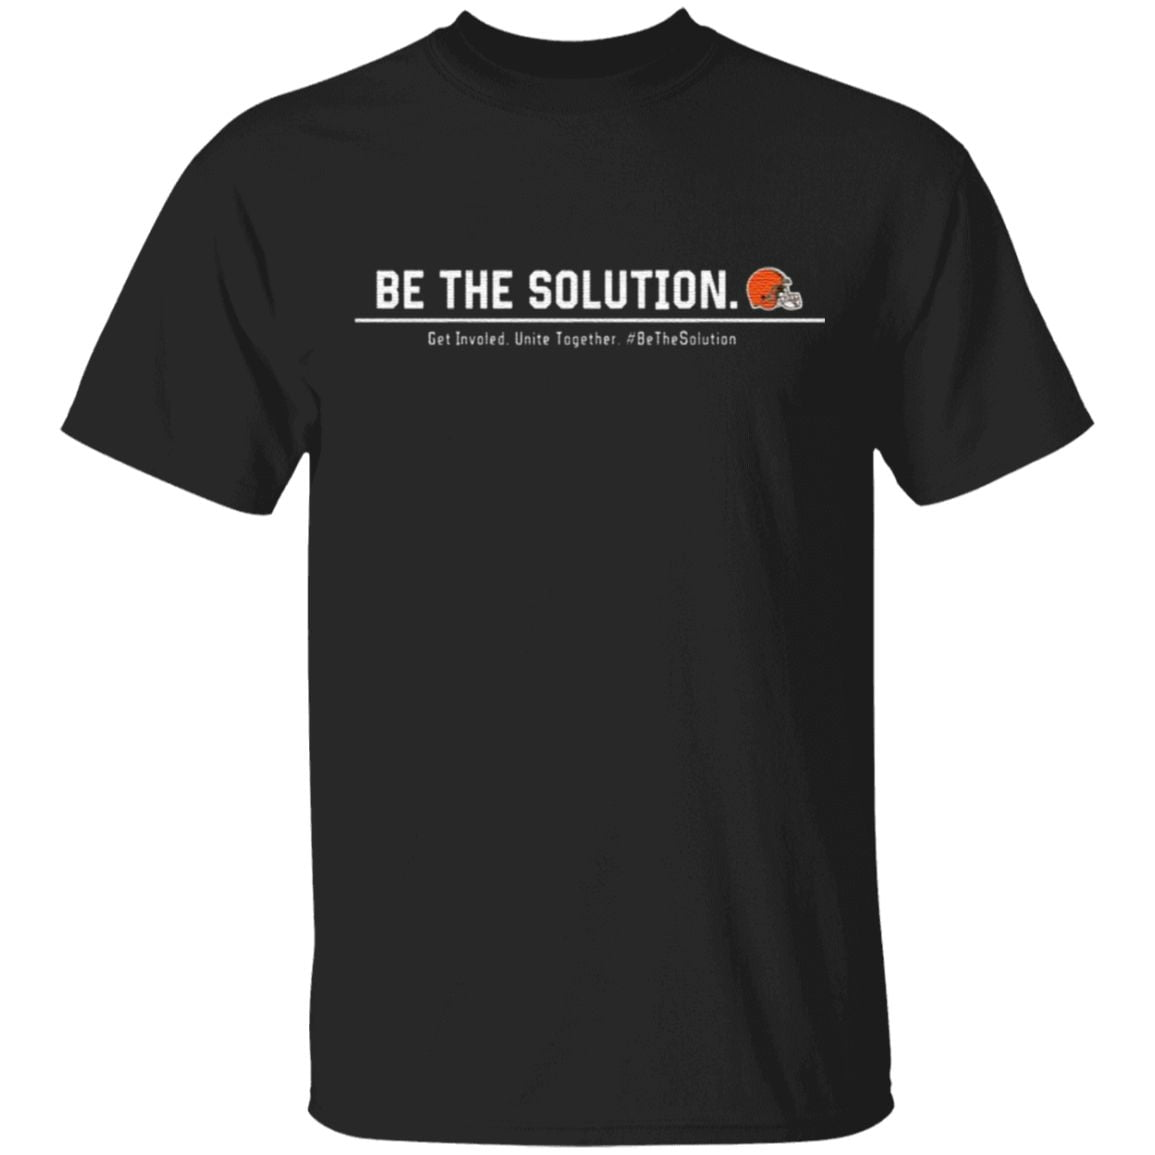 Odell Beckham Be The Solution Get Involved Unite Together T Shirt